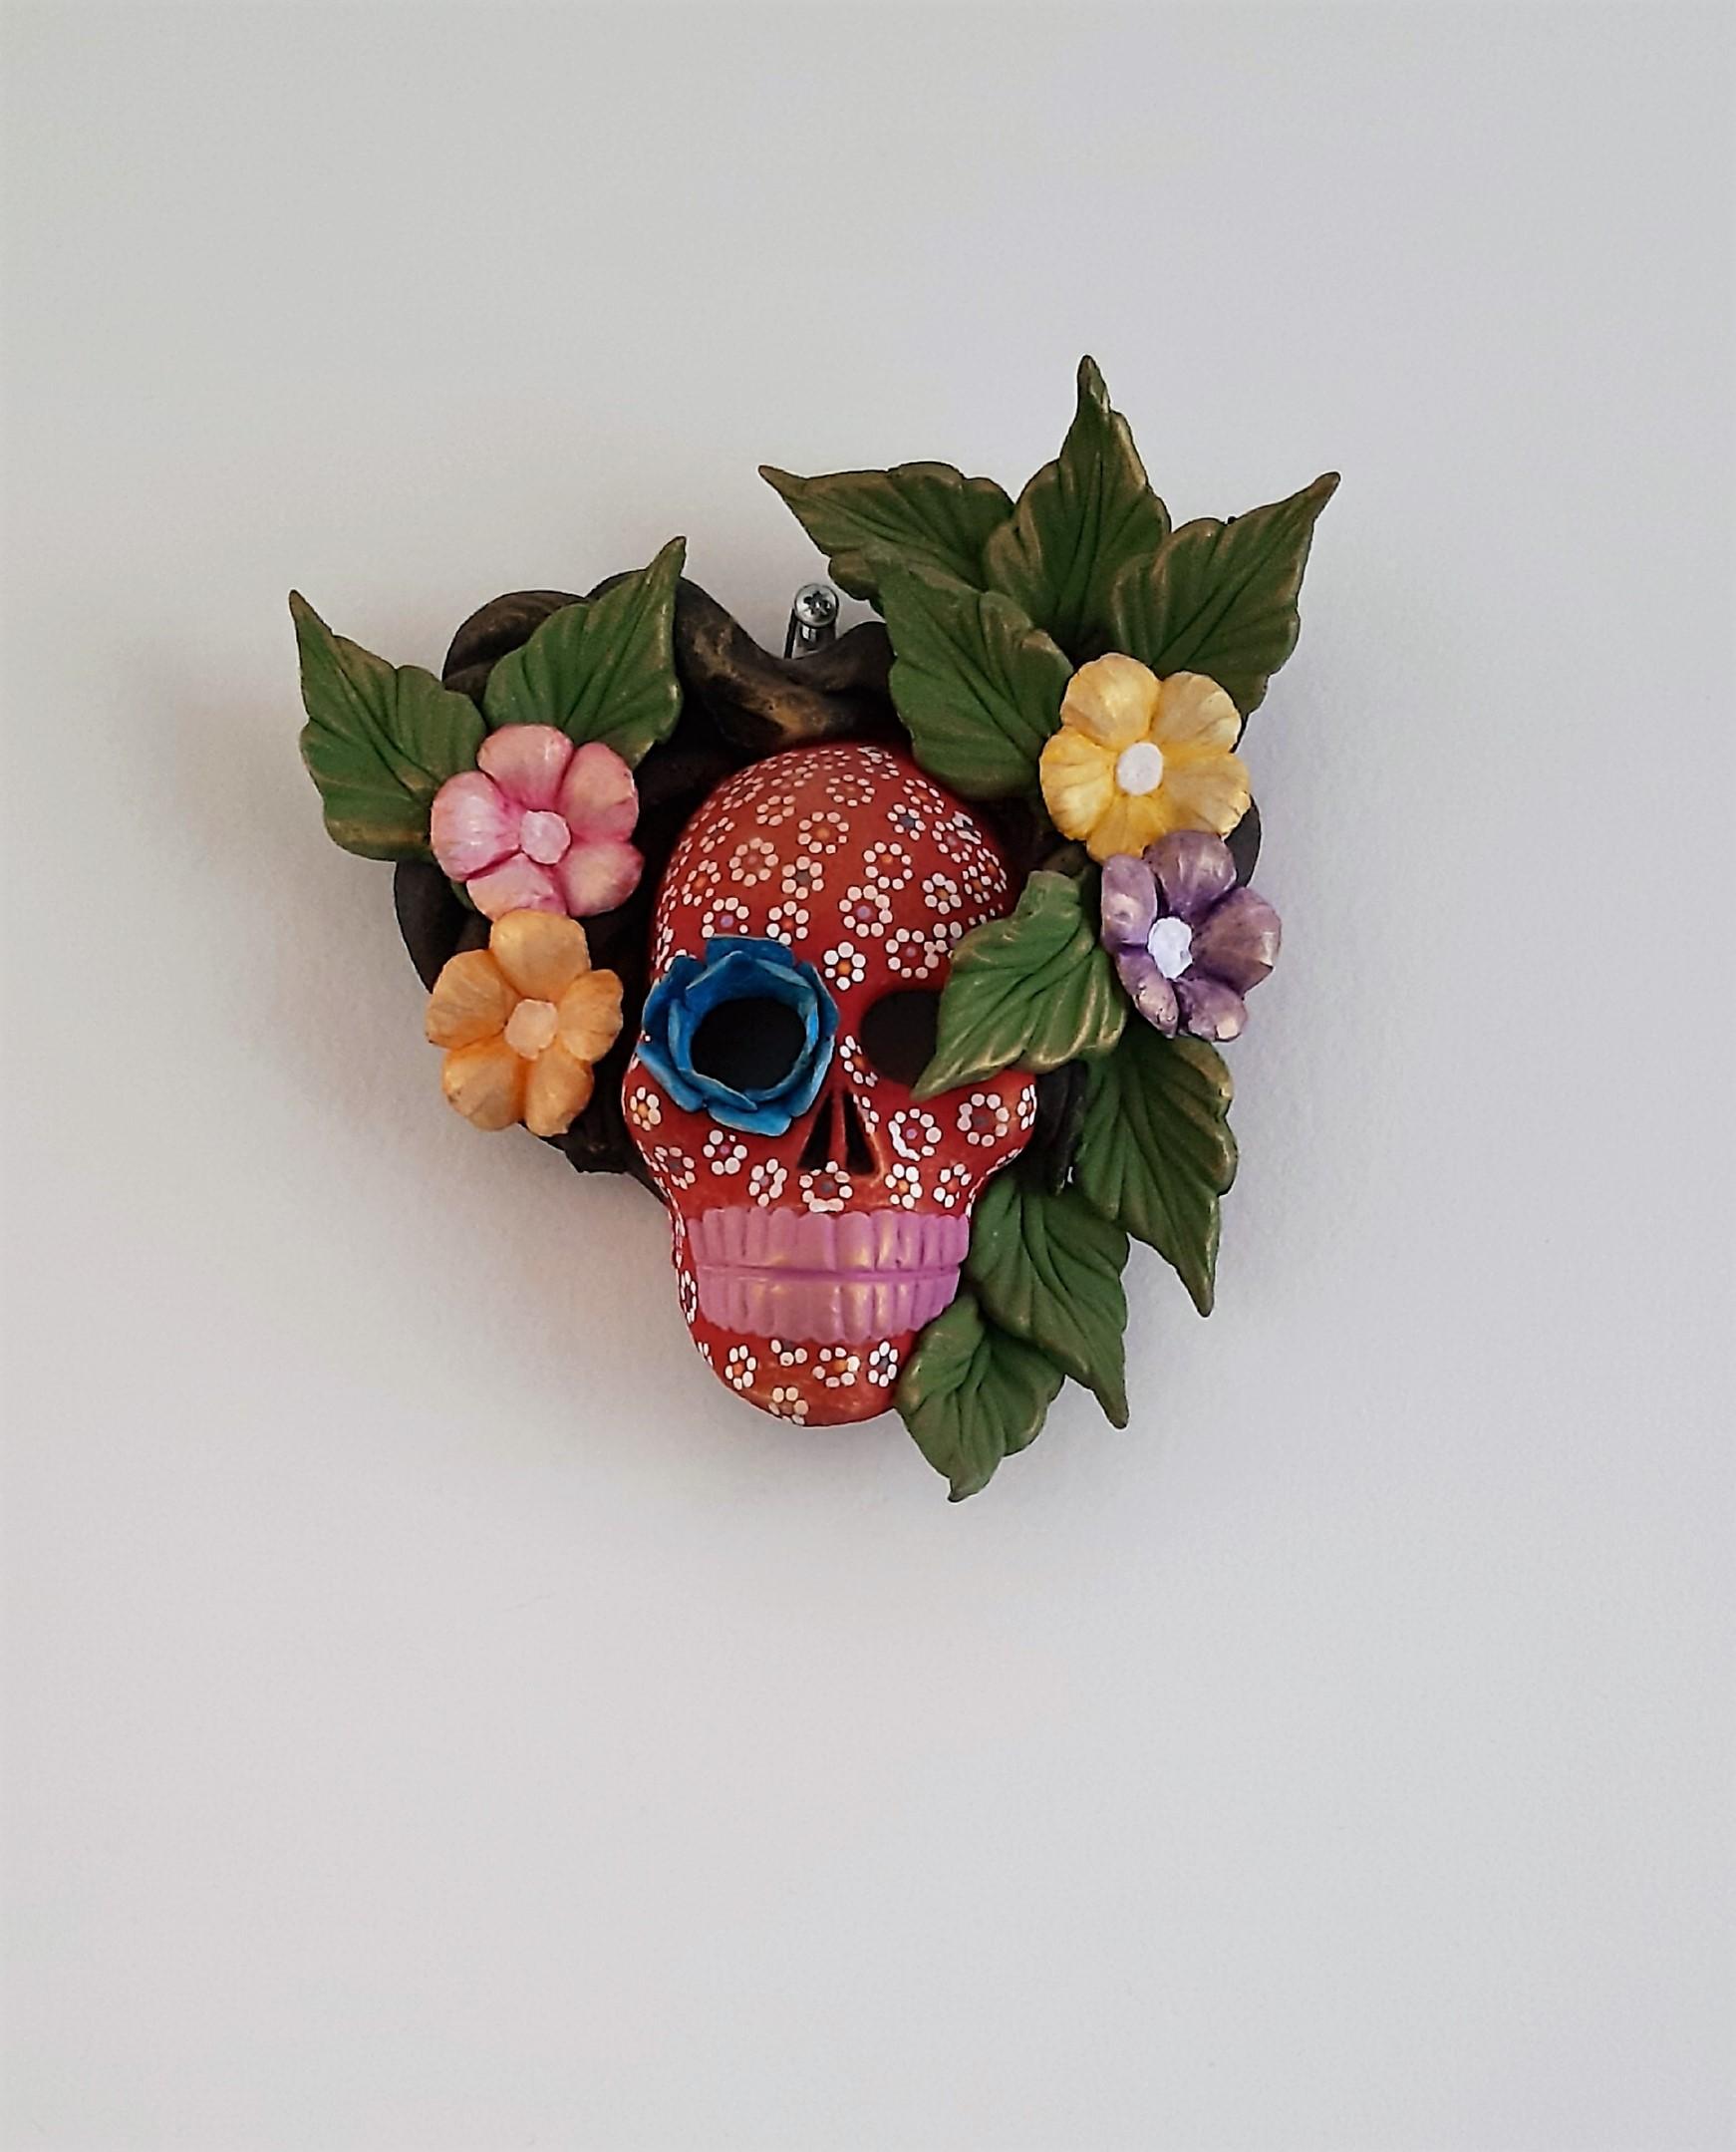 Mexican Art & Design